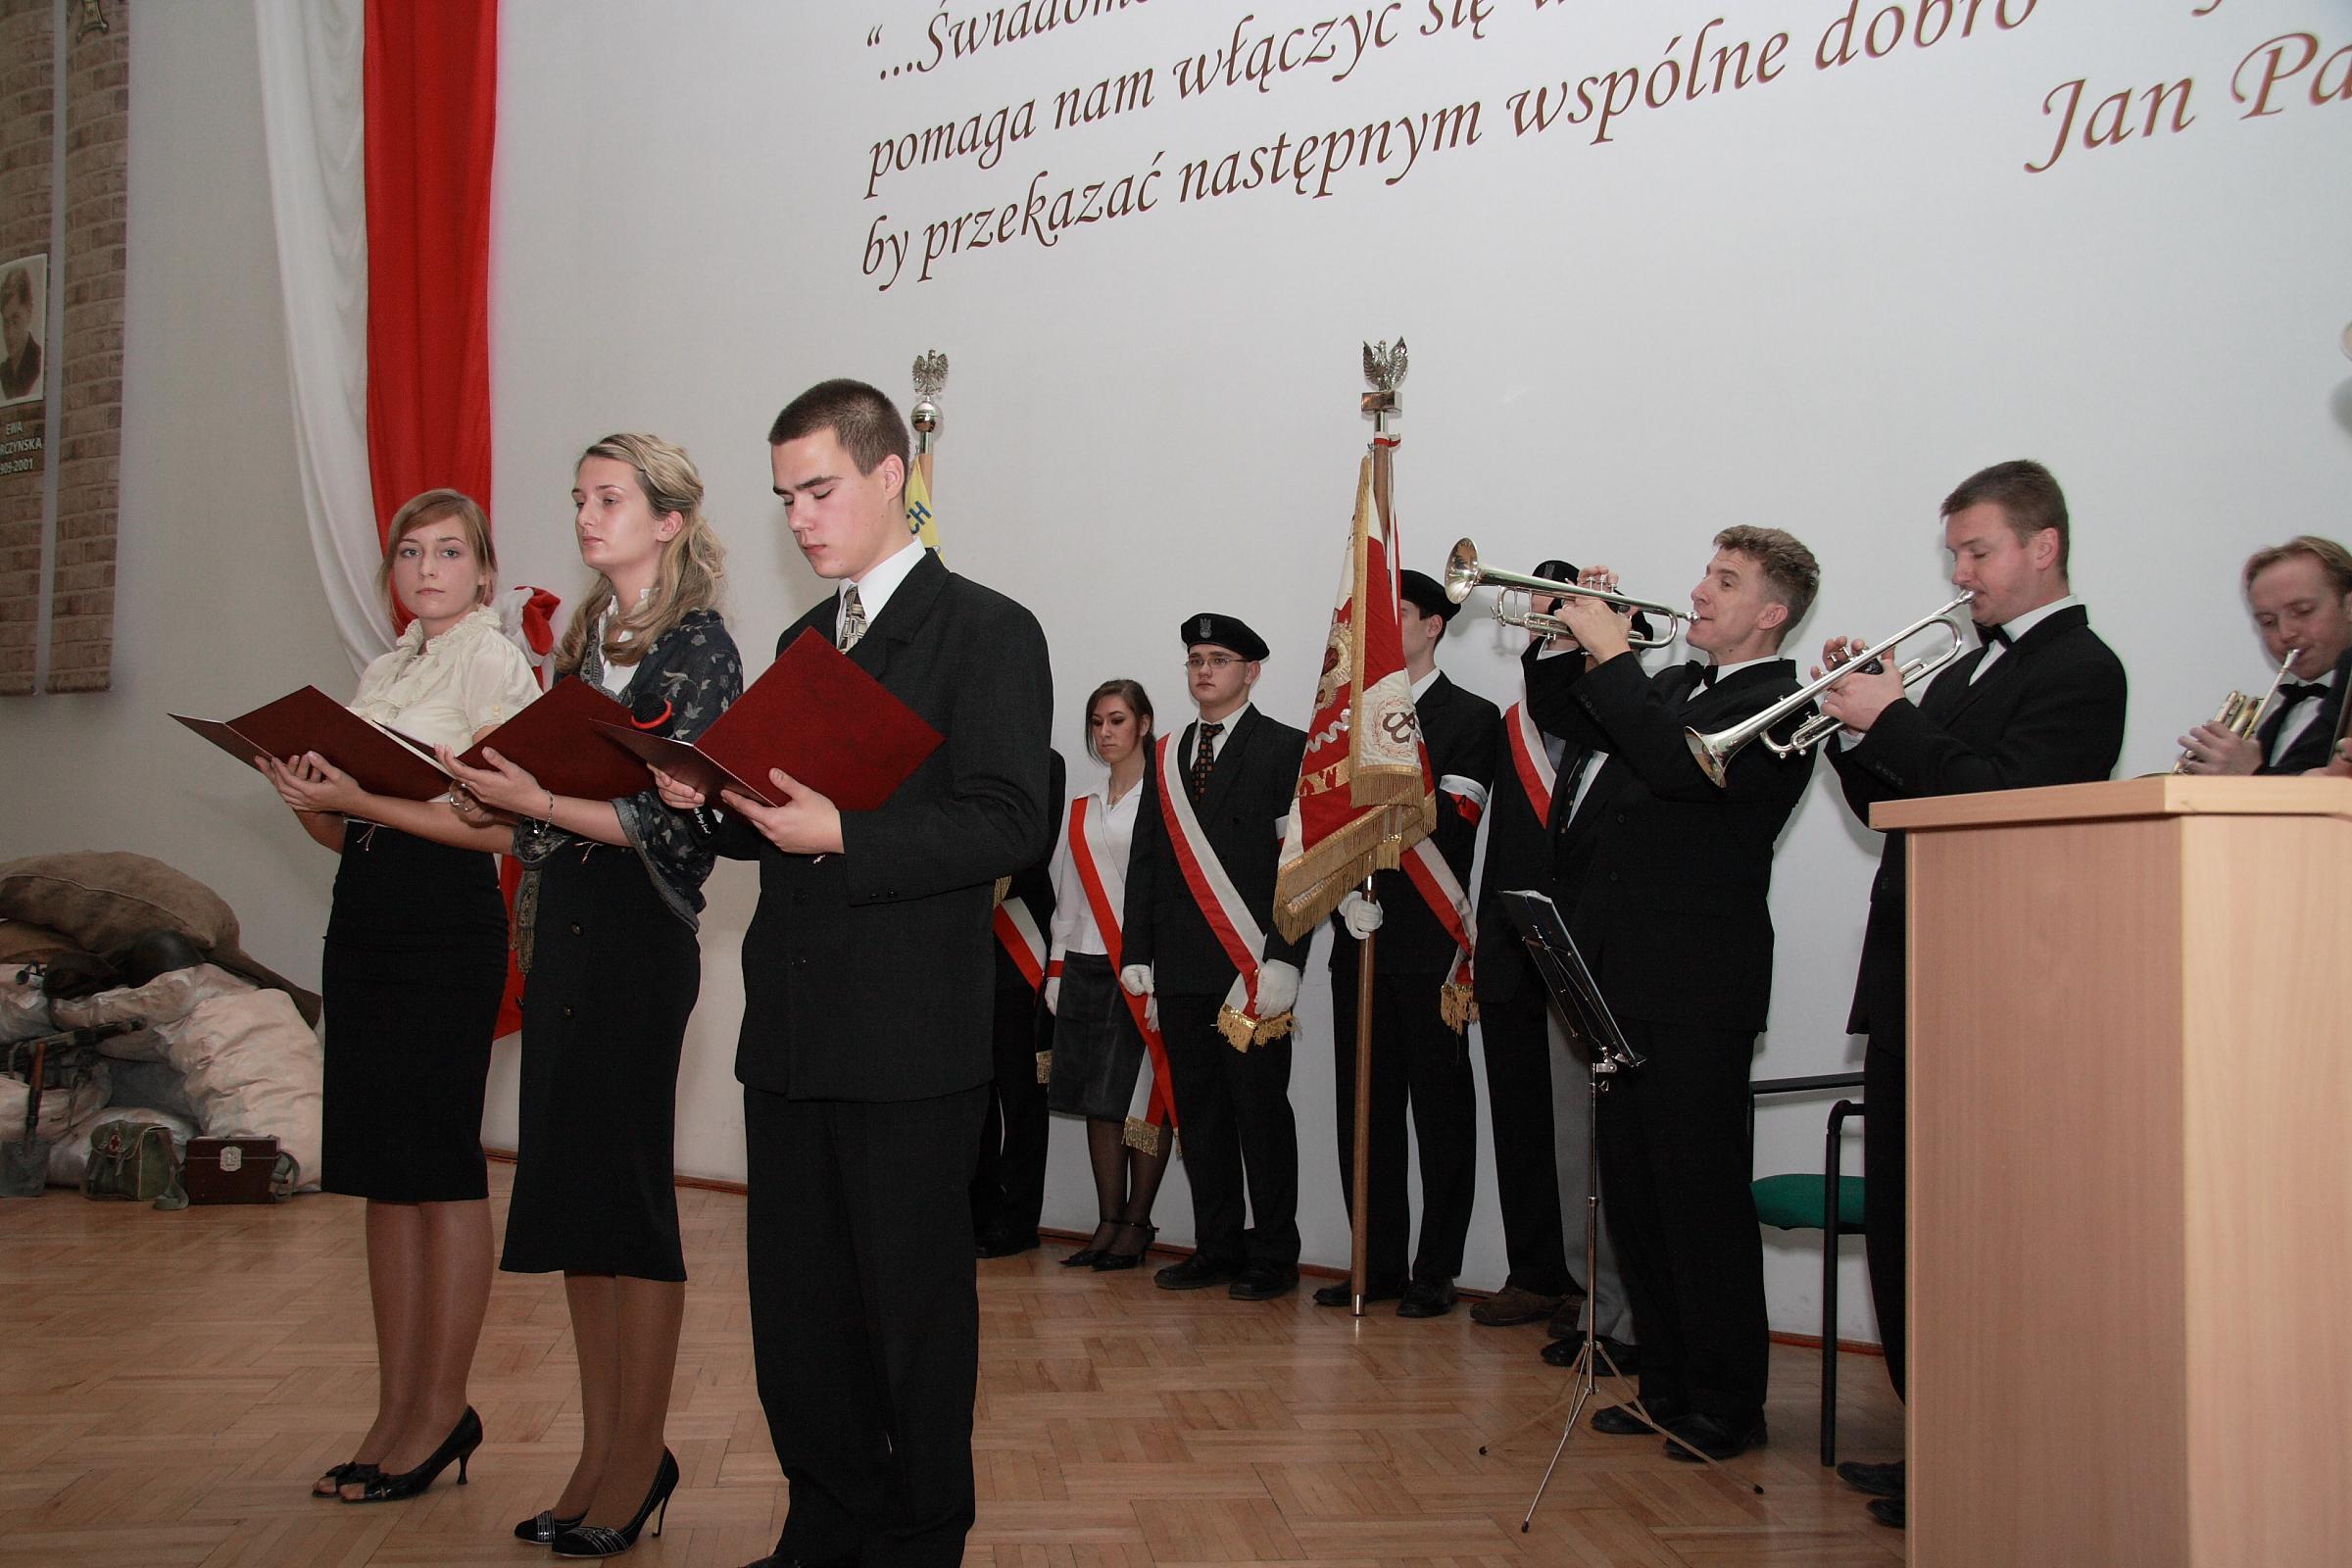 KorczynskaAkademia_2007-11-09_001